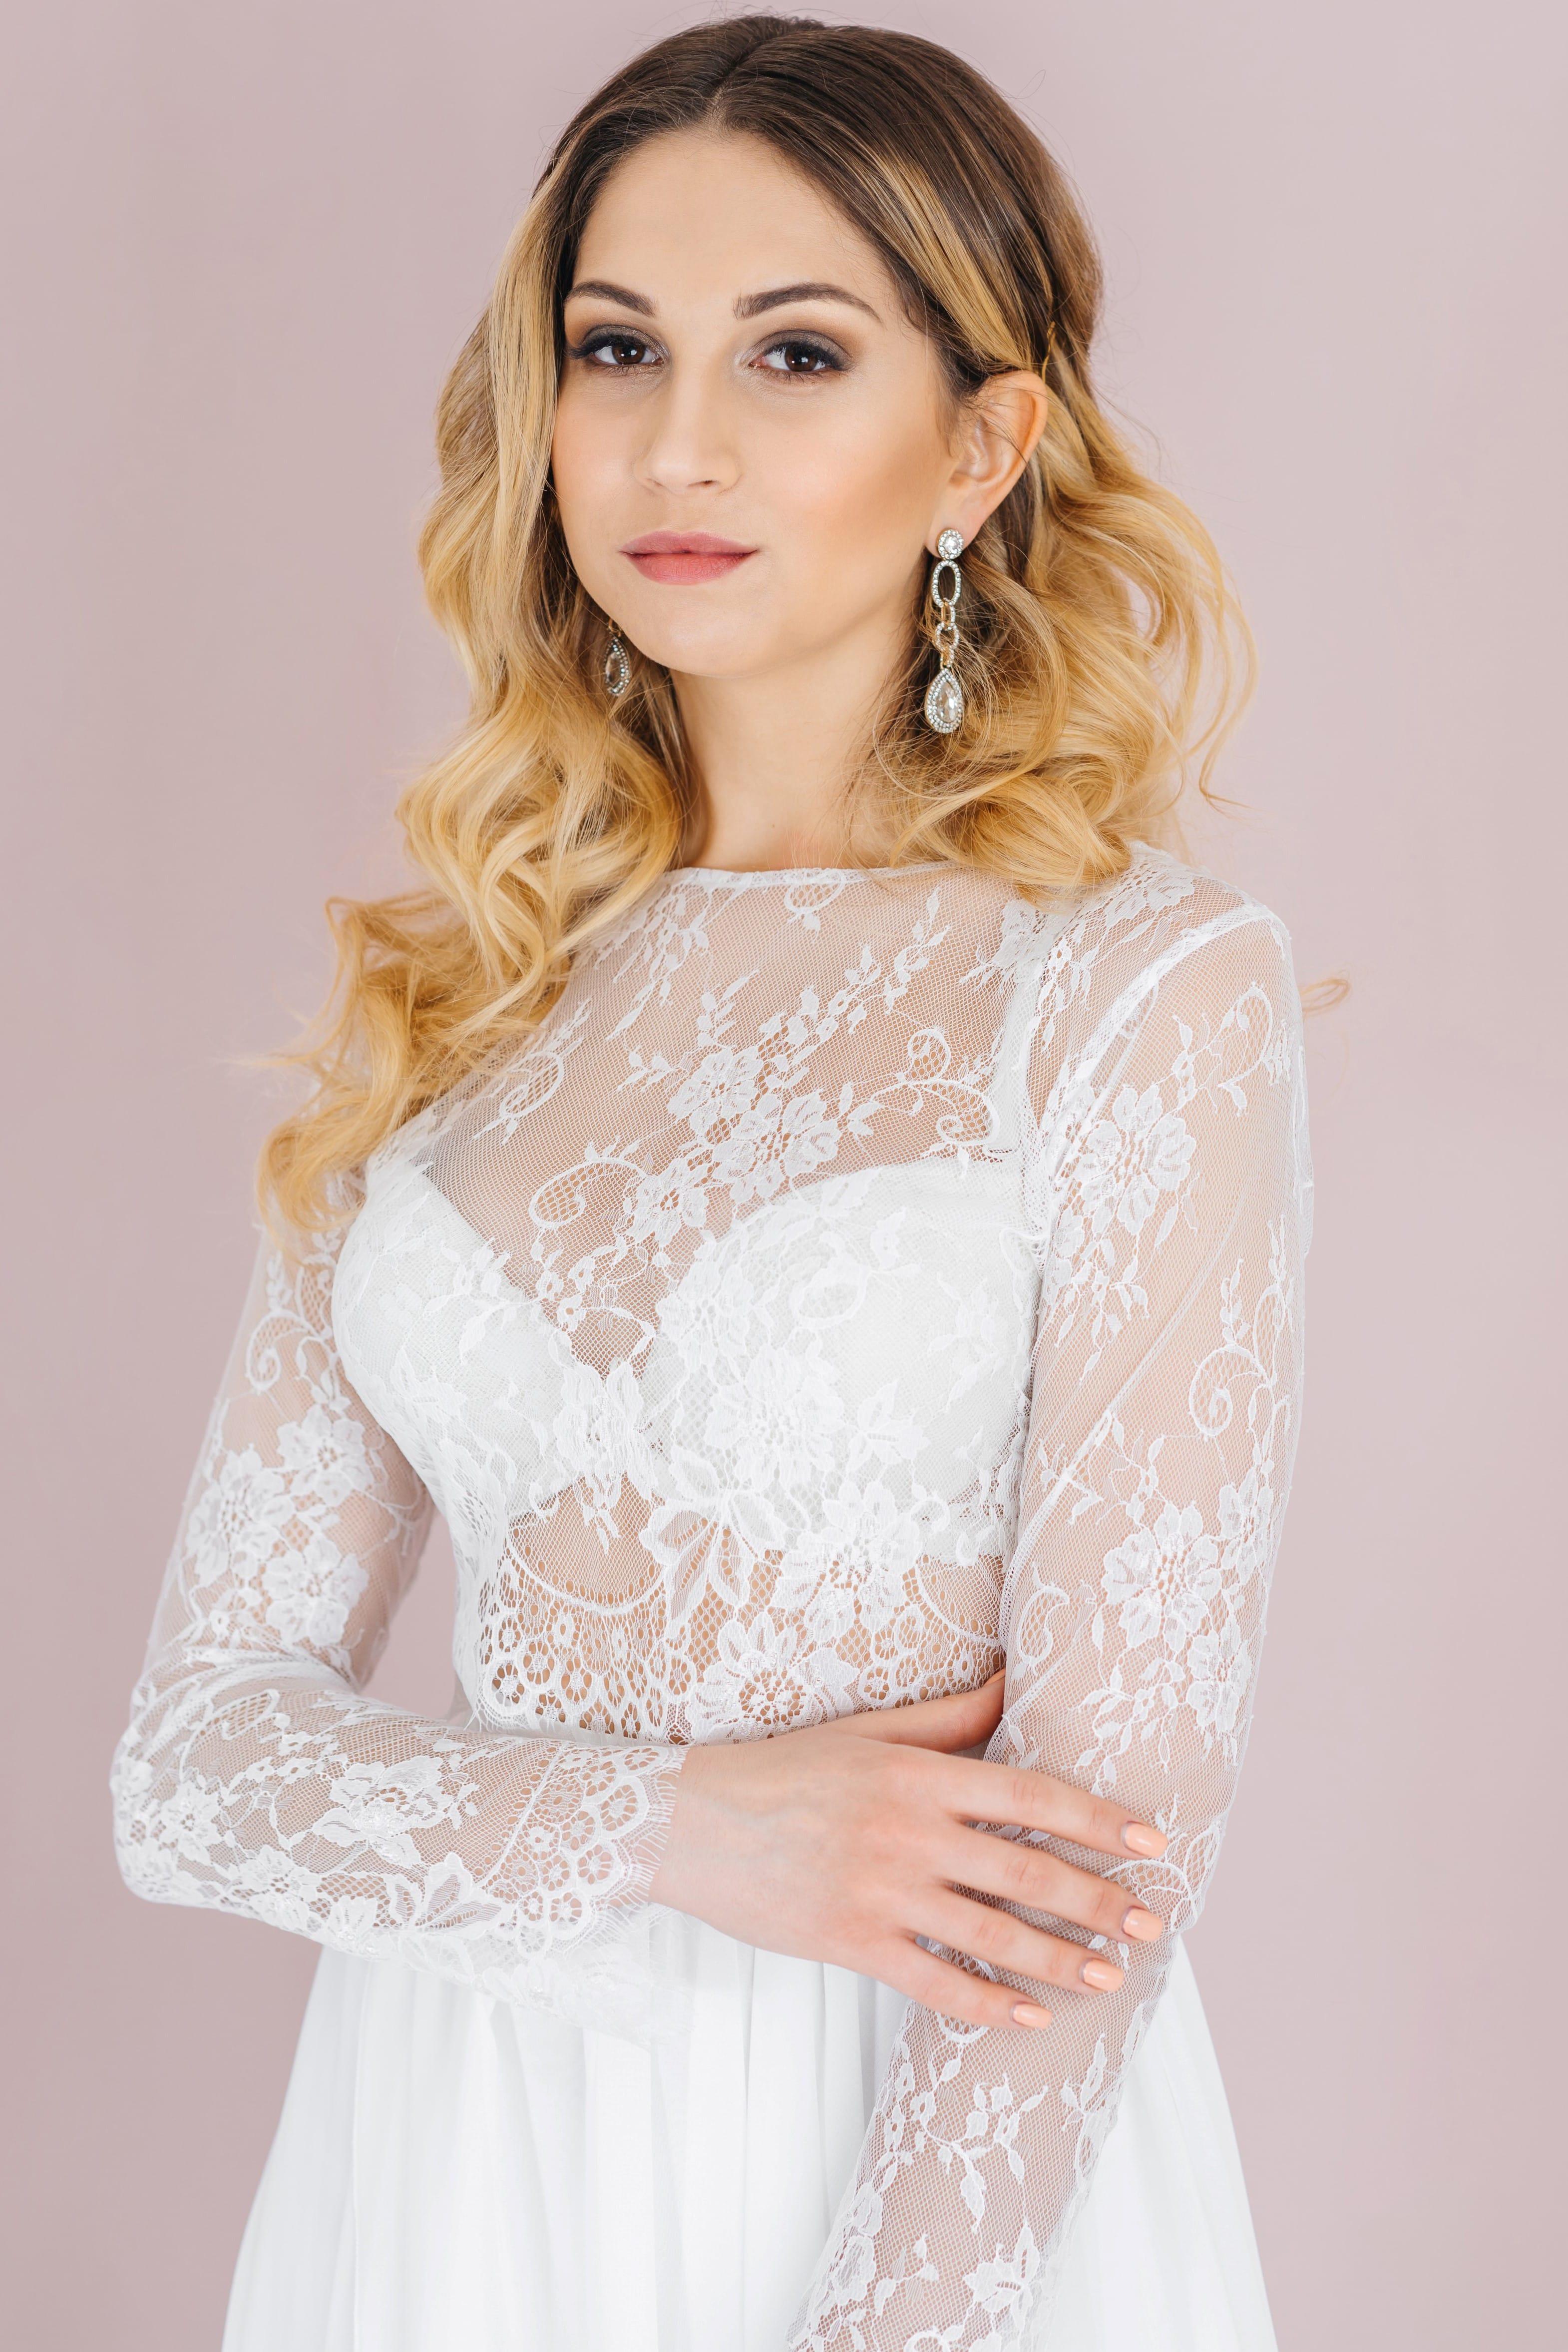 Свадебное платье CHALSIE, коллекция LOFT, бренд RARE BRIDAL, фото 4